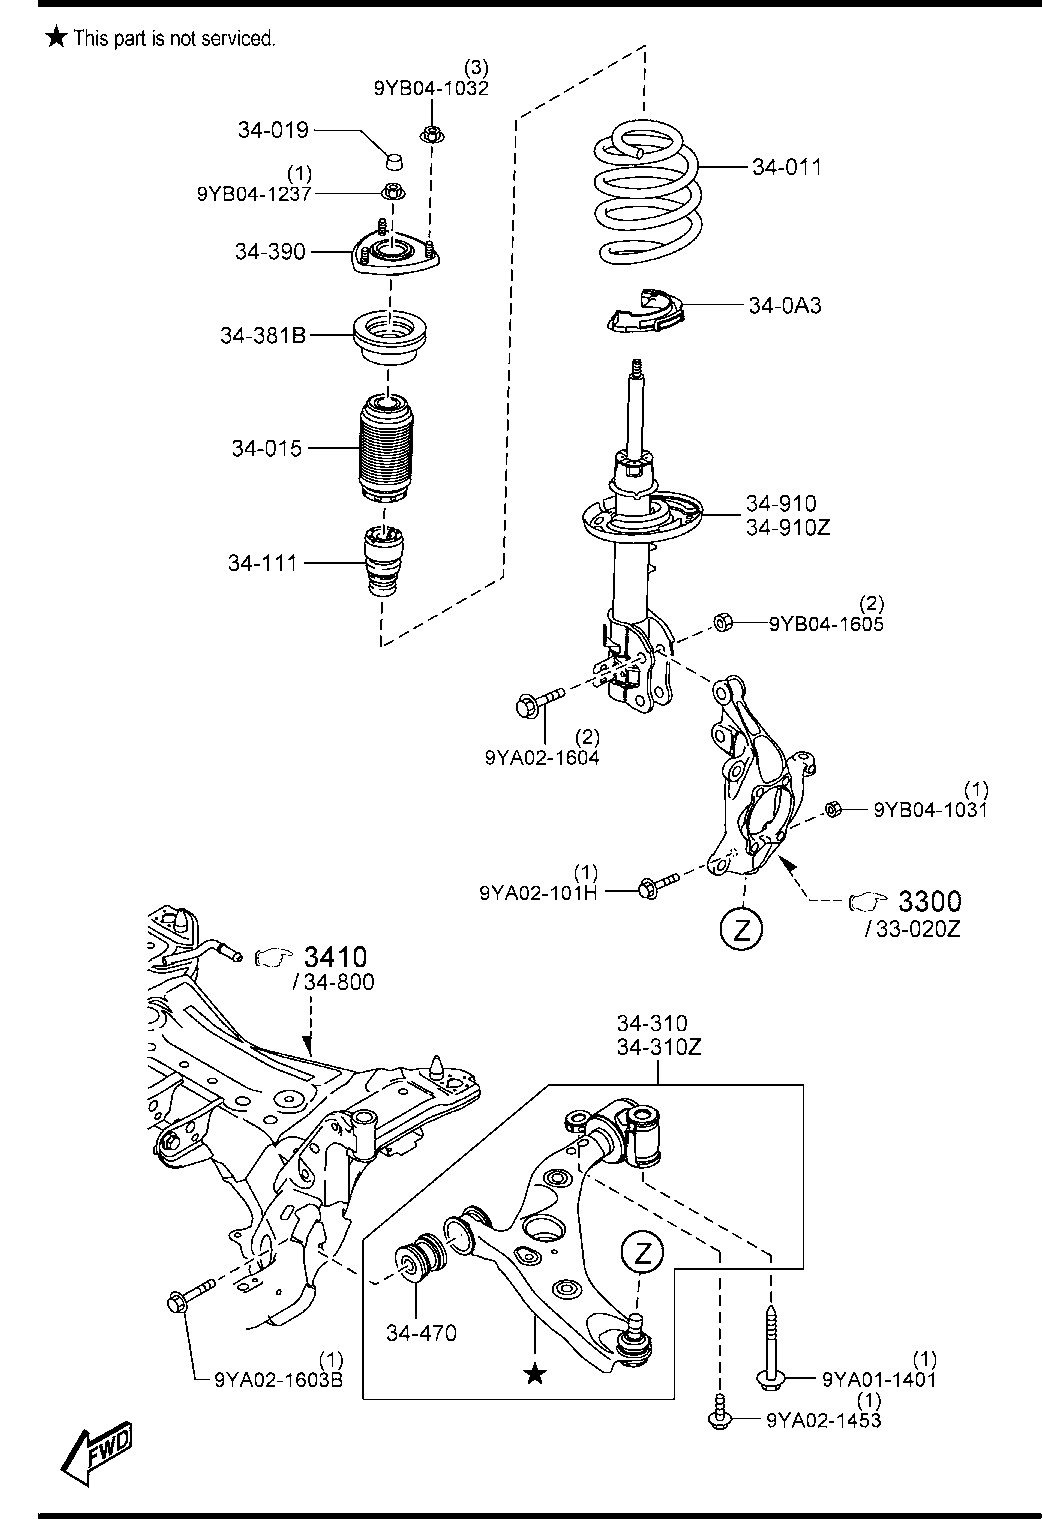 Mazda 6 Parts List